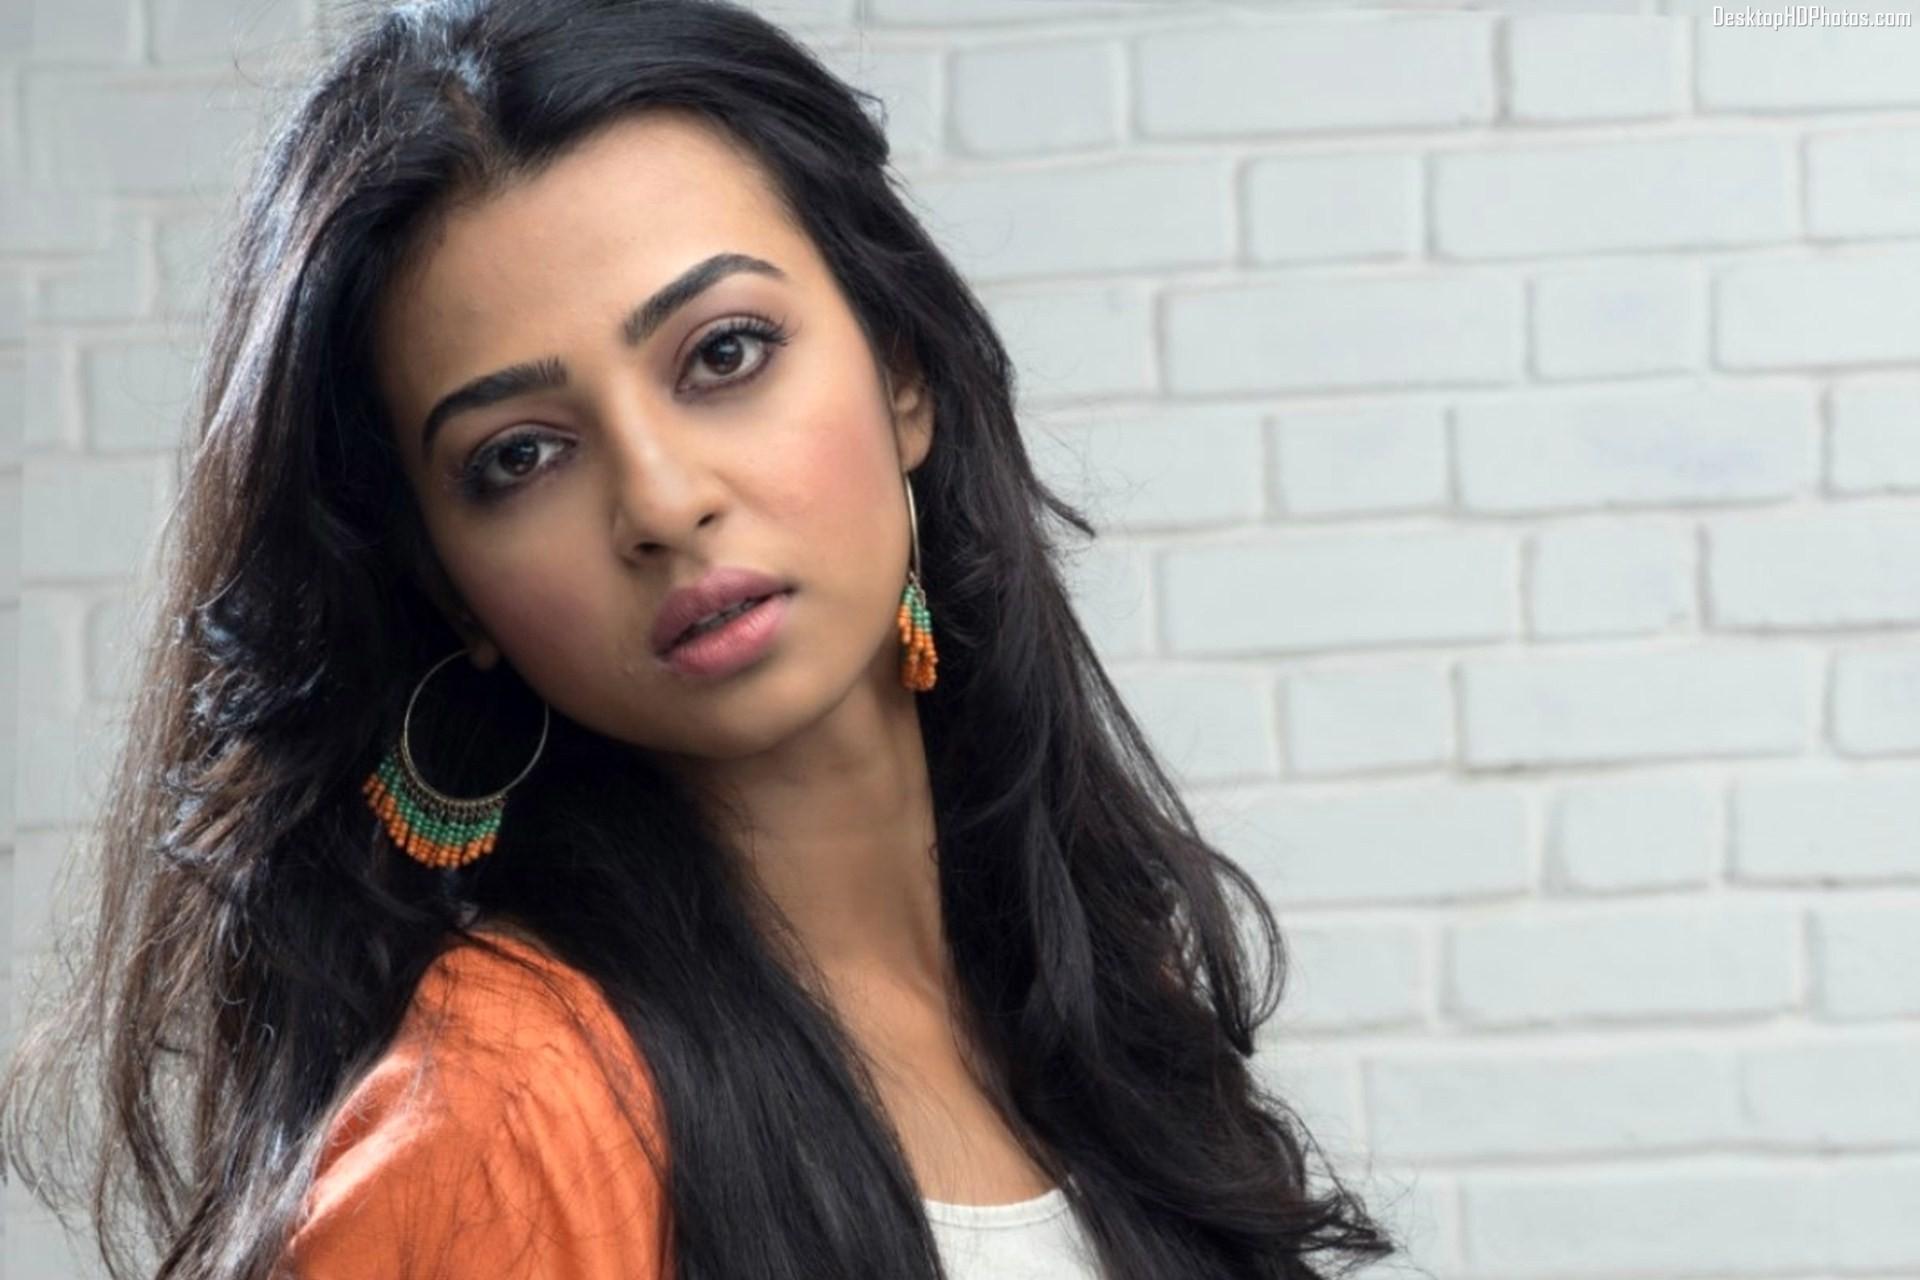 radhika apte imdb